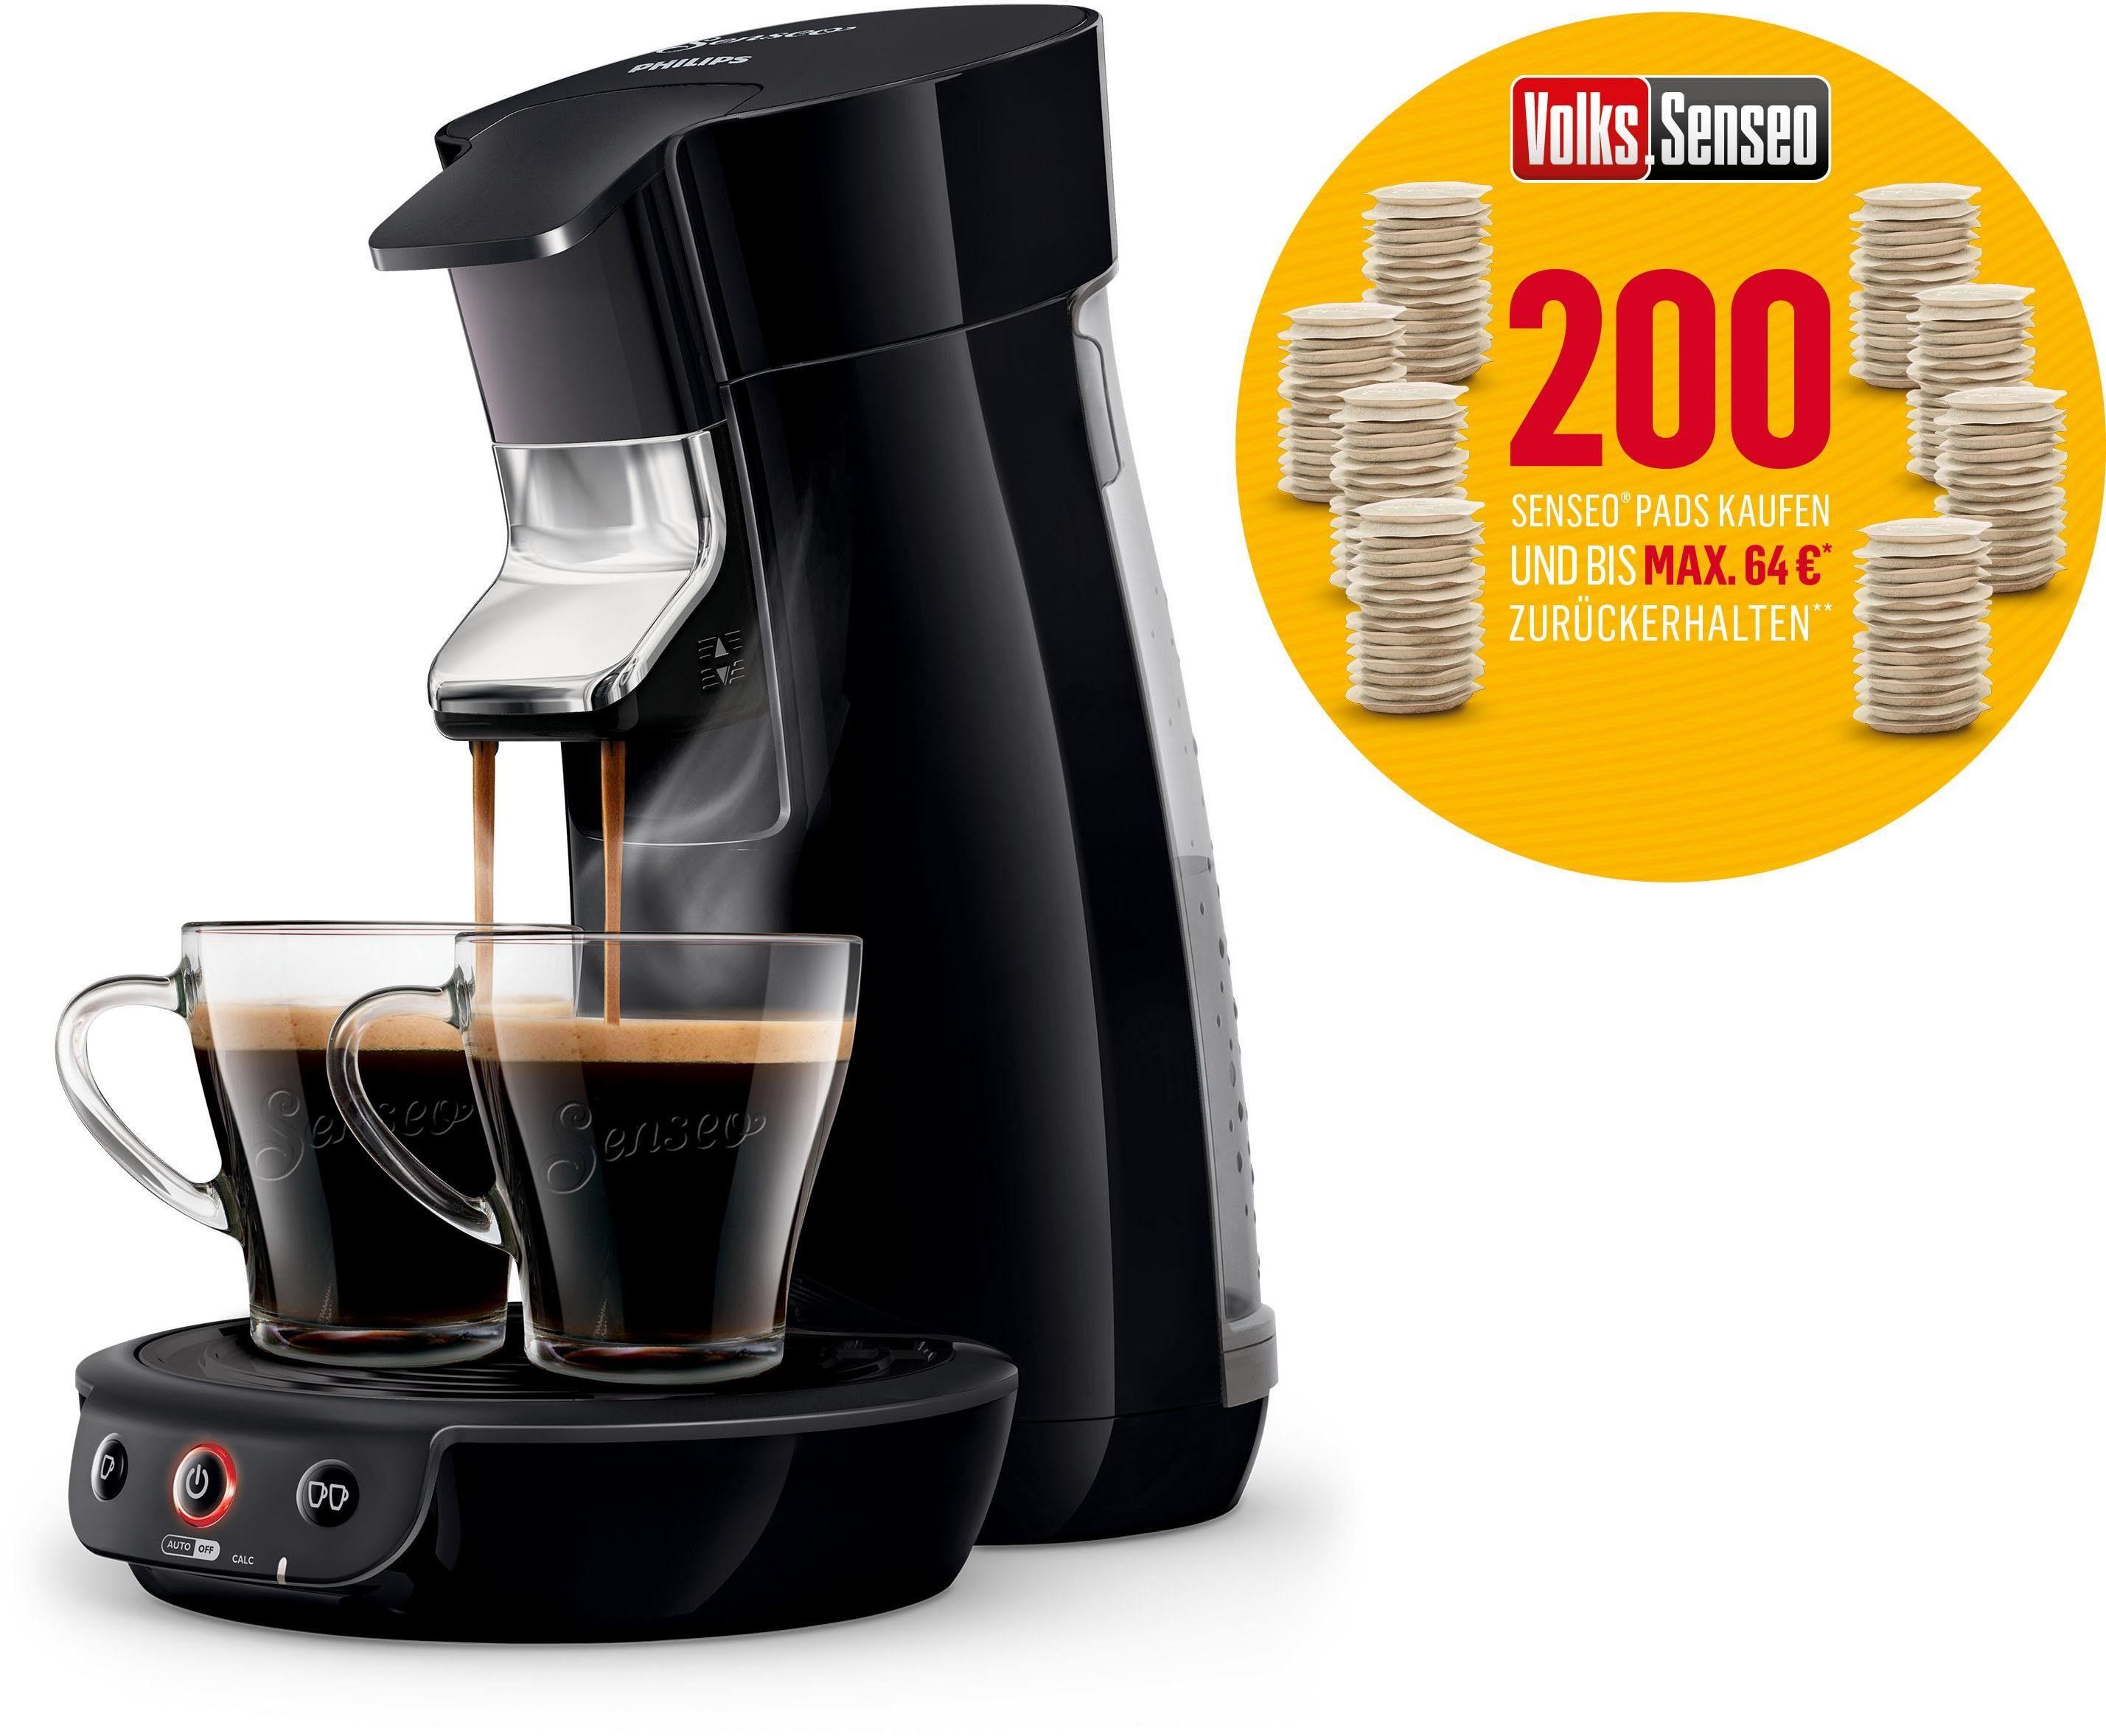 Senseo Kaffeepadmaschine HD6561/69 Viva Café Volks-Senseo